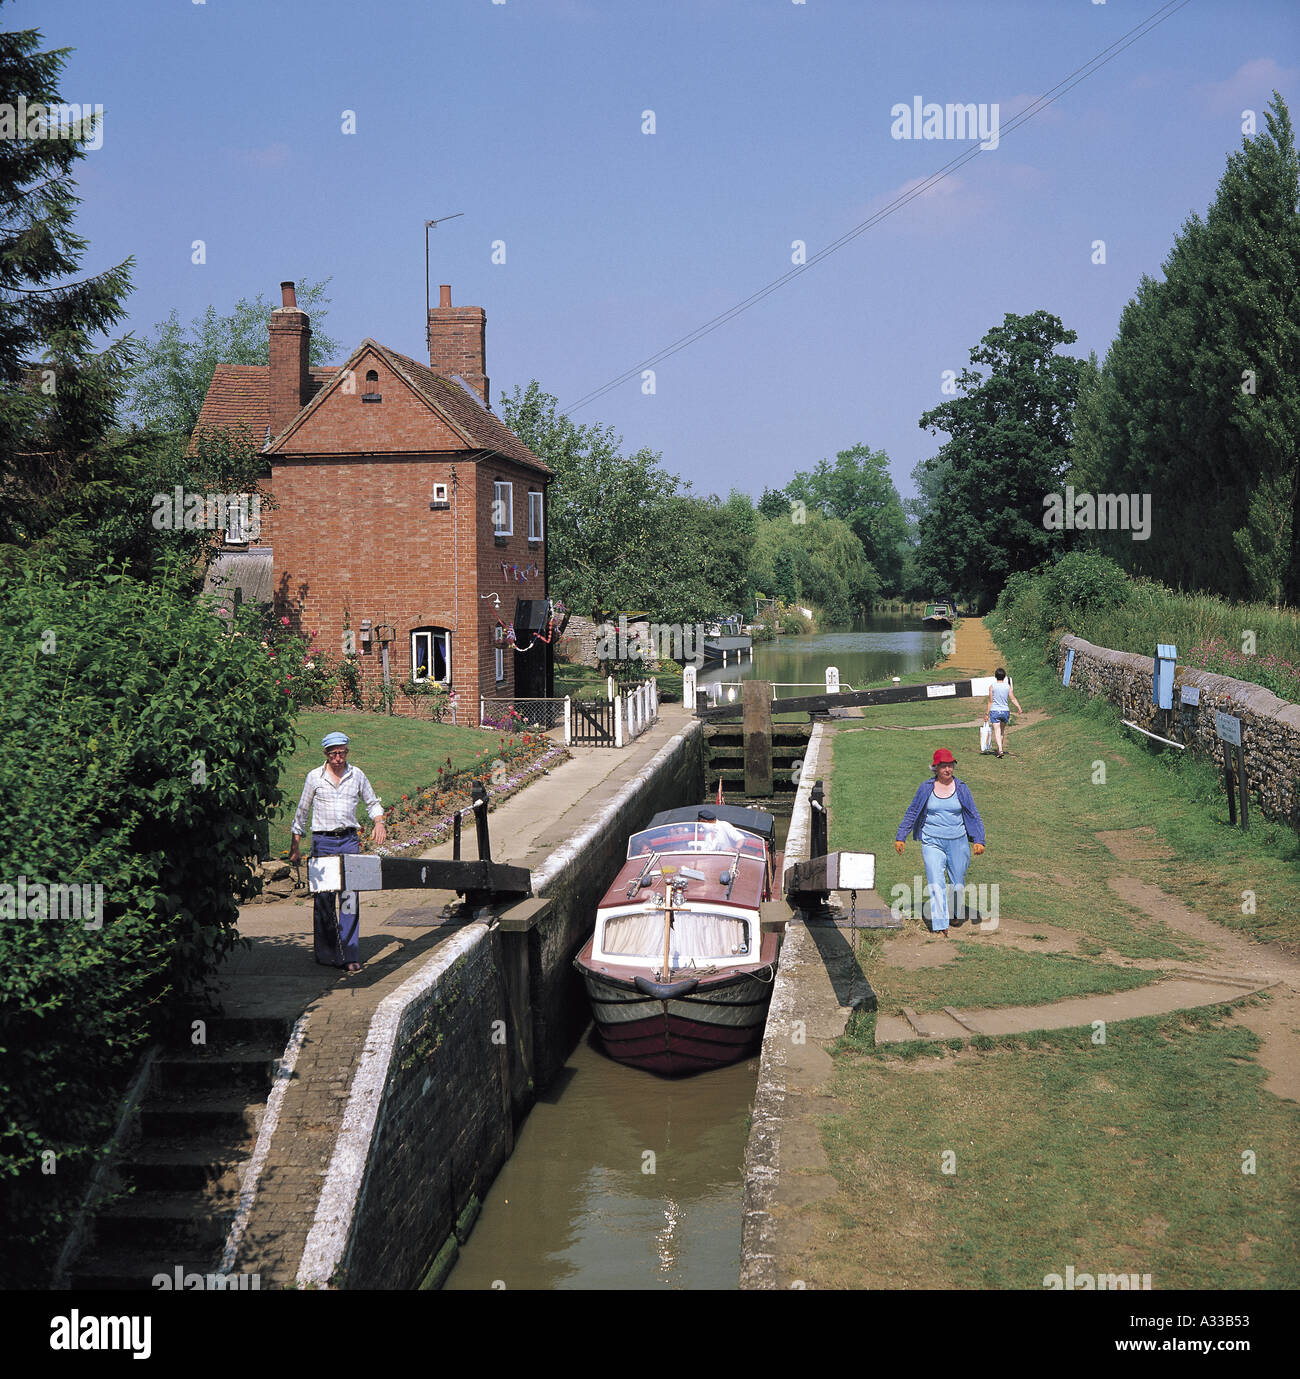 Banbury - Stock Image